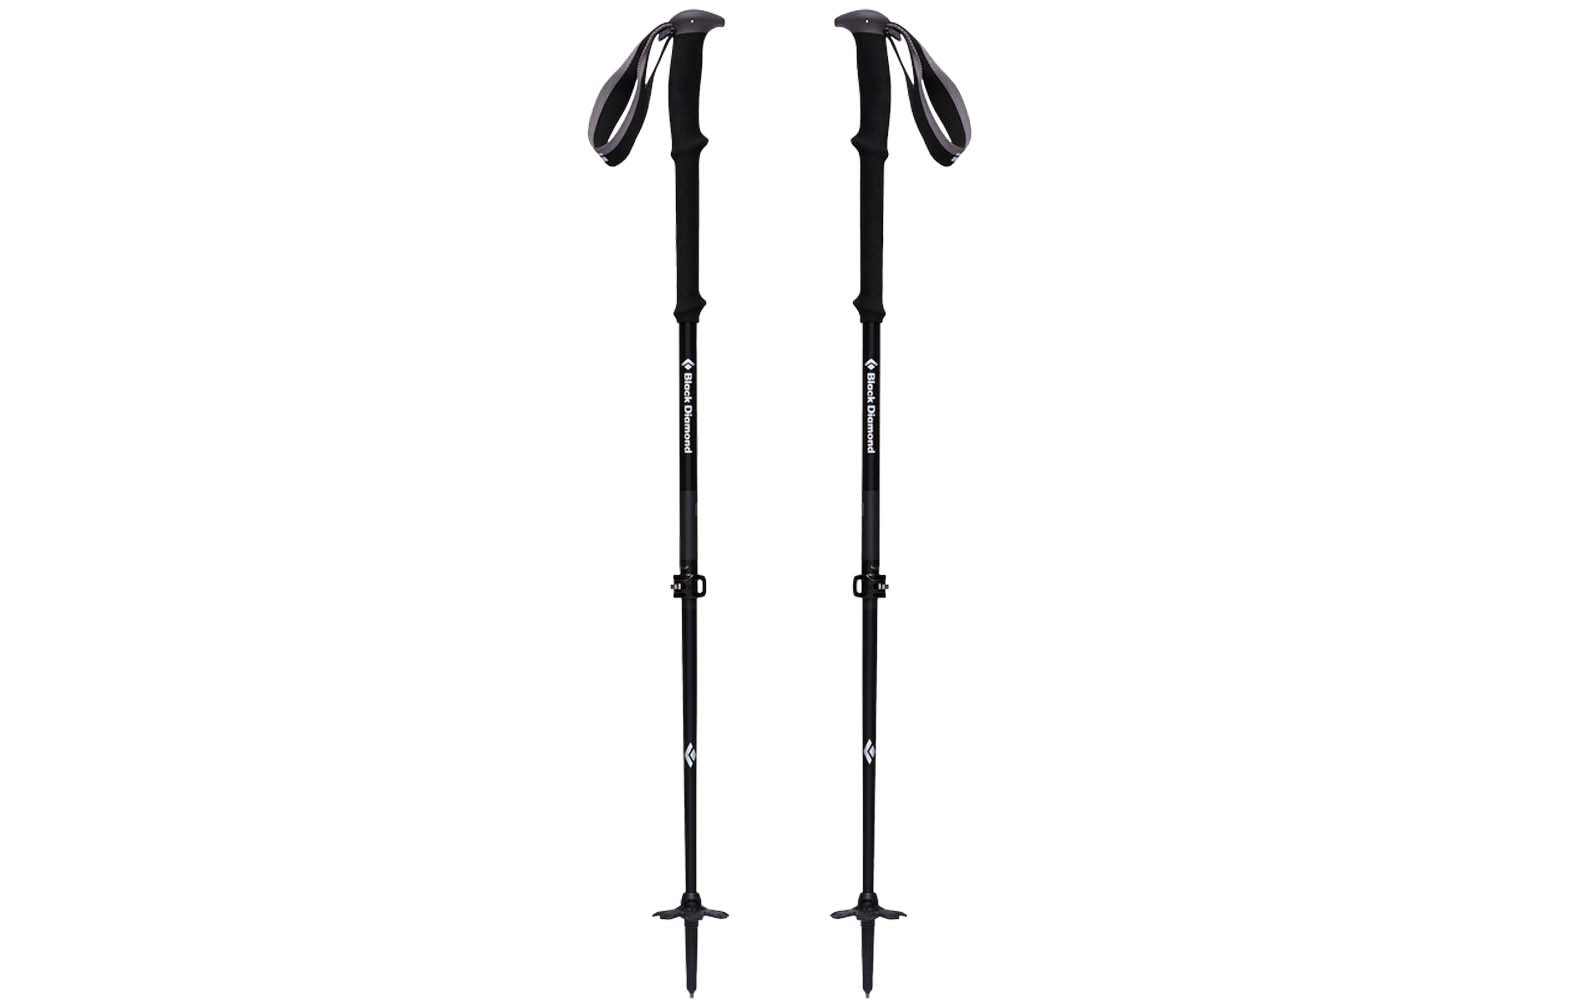 Bastones de esquí Black Diamond Vapor Carbon 2